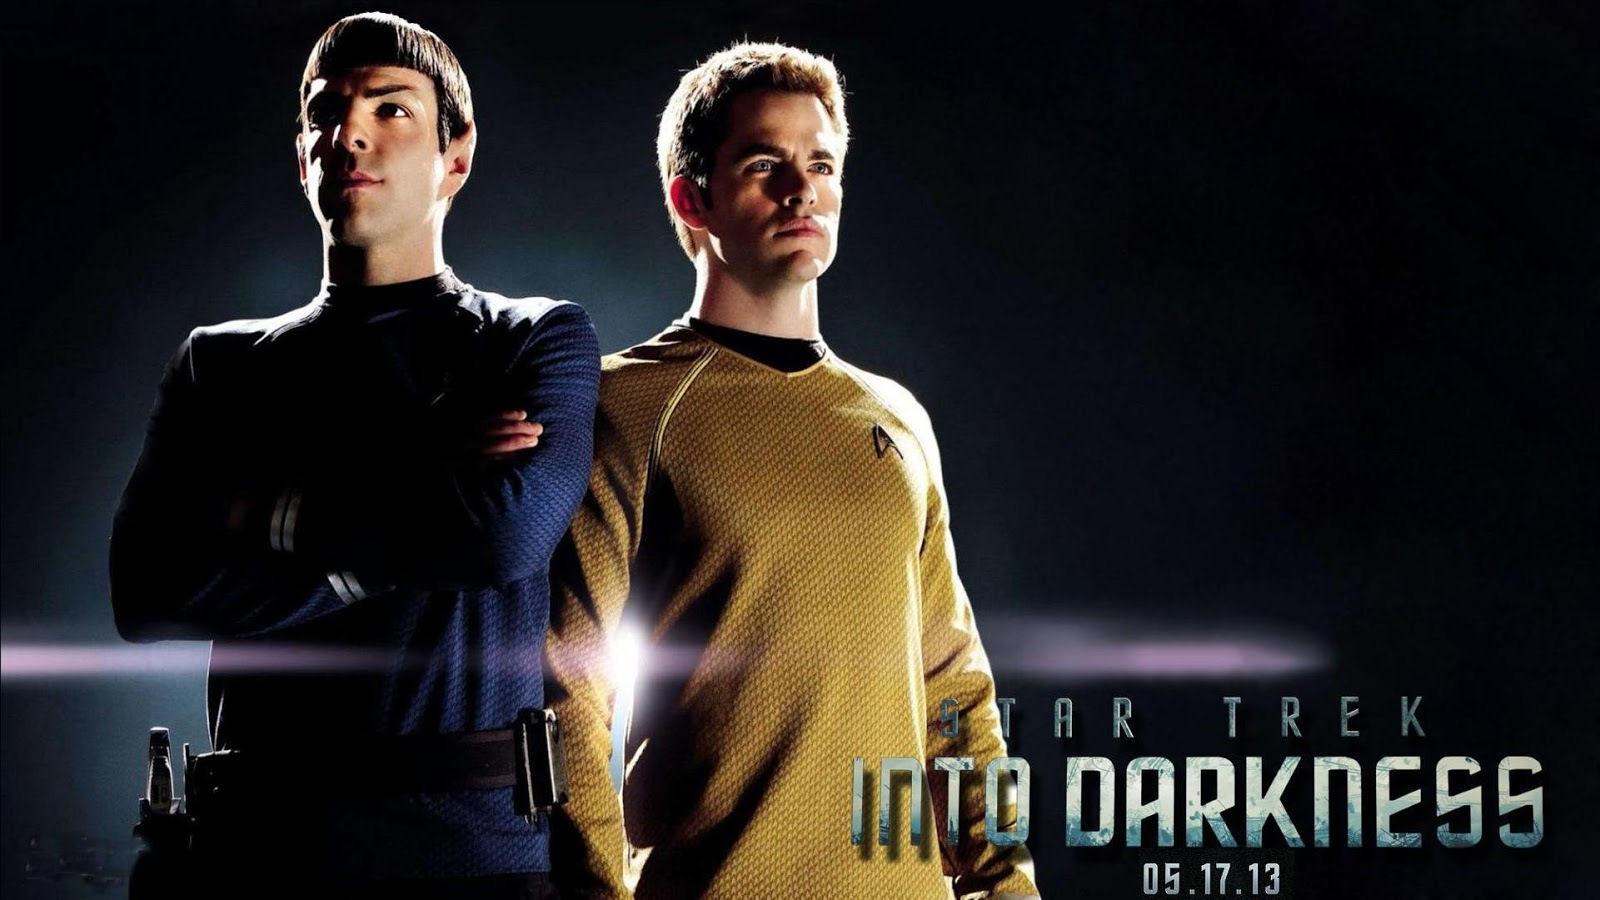 Star Trek 2013 Movie Wallpaper 1600x900